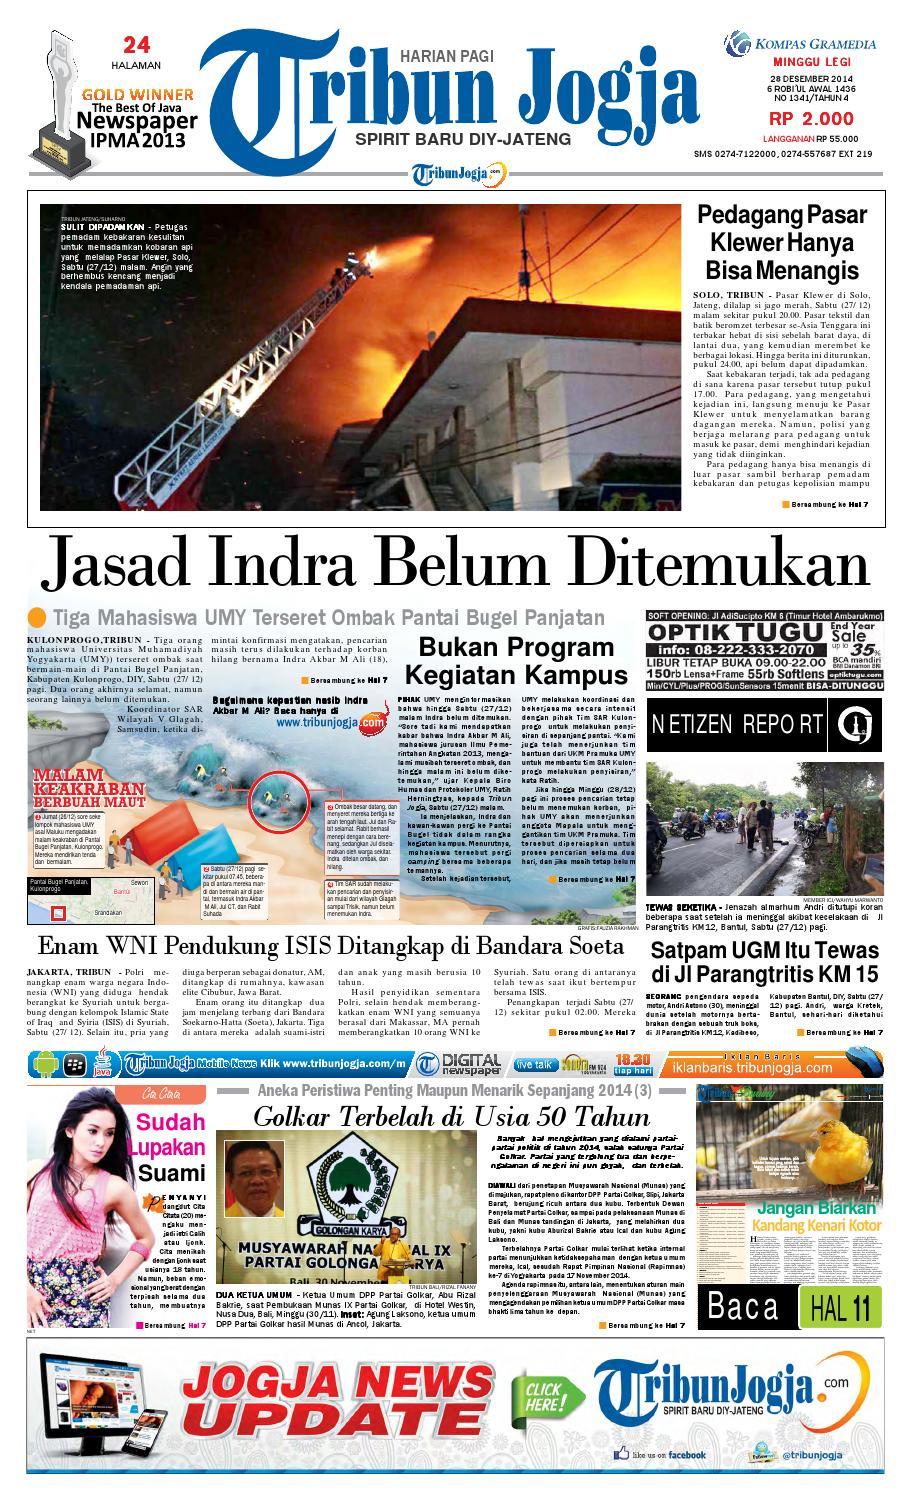 Tribunjogja 28 12 2014 By Tribun Jogja Issuu Kue Mawar Nuris Bakeri Ampamp Caterring Akumandiri